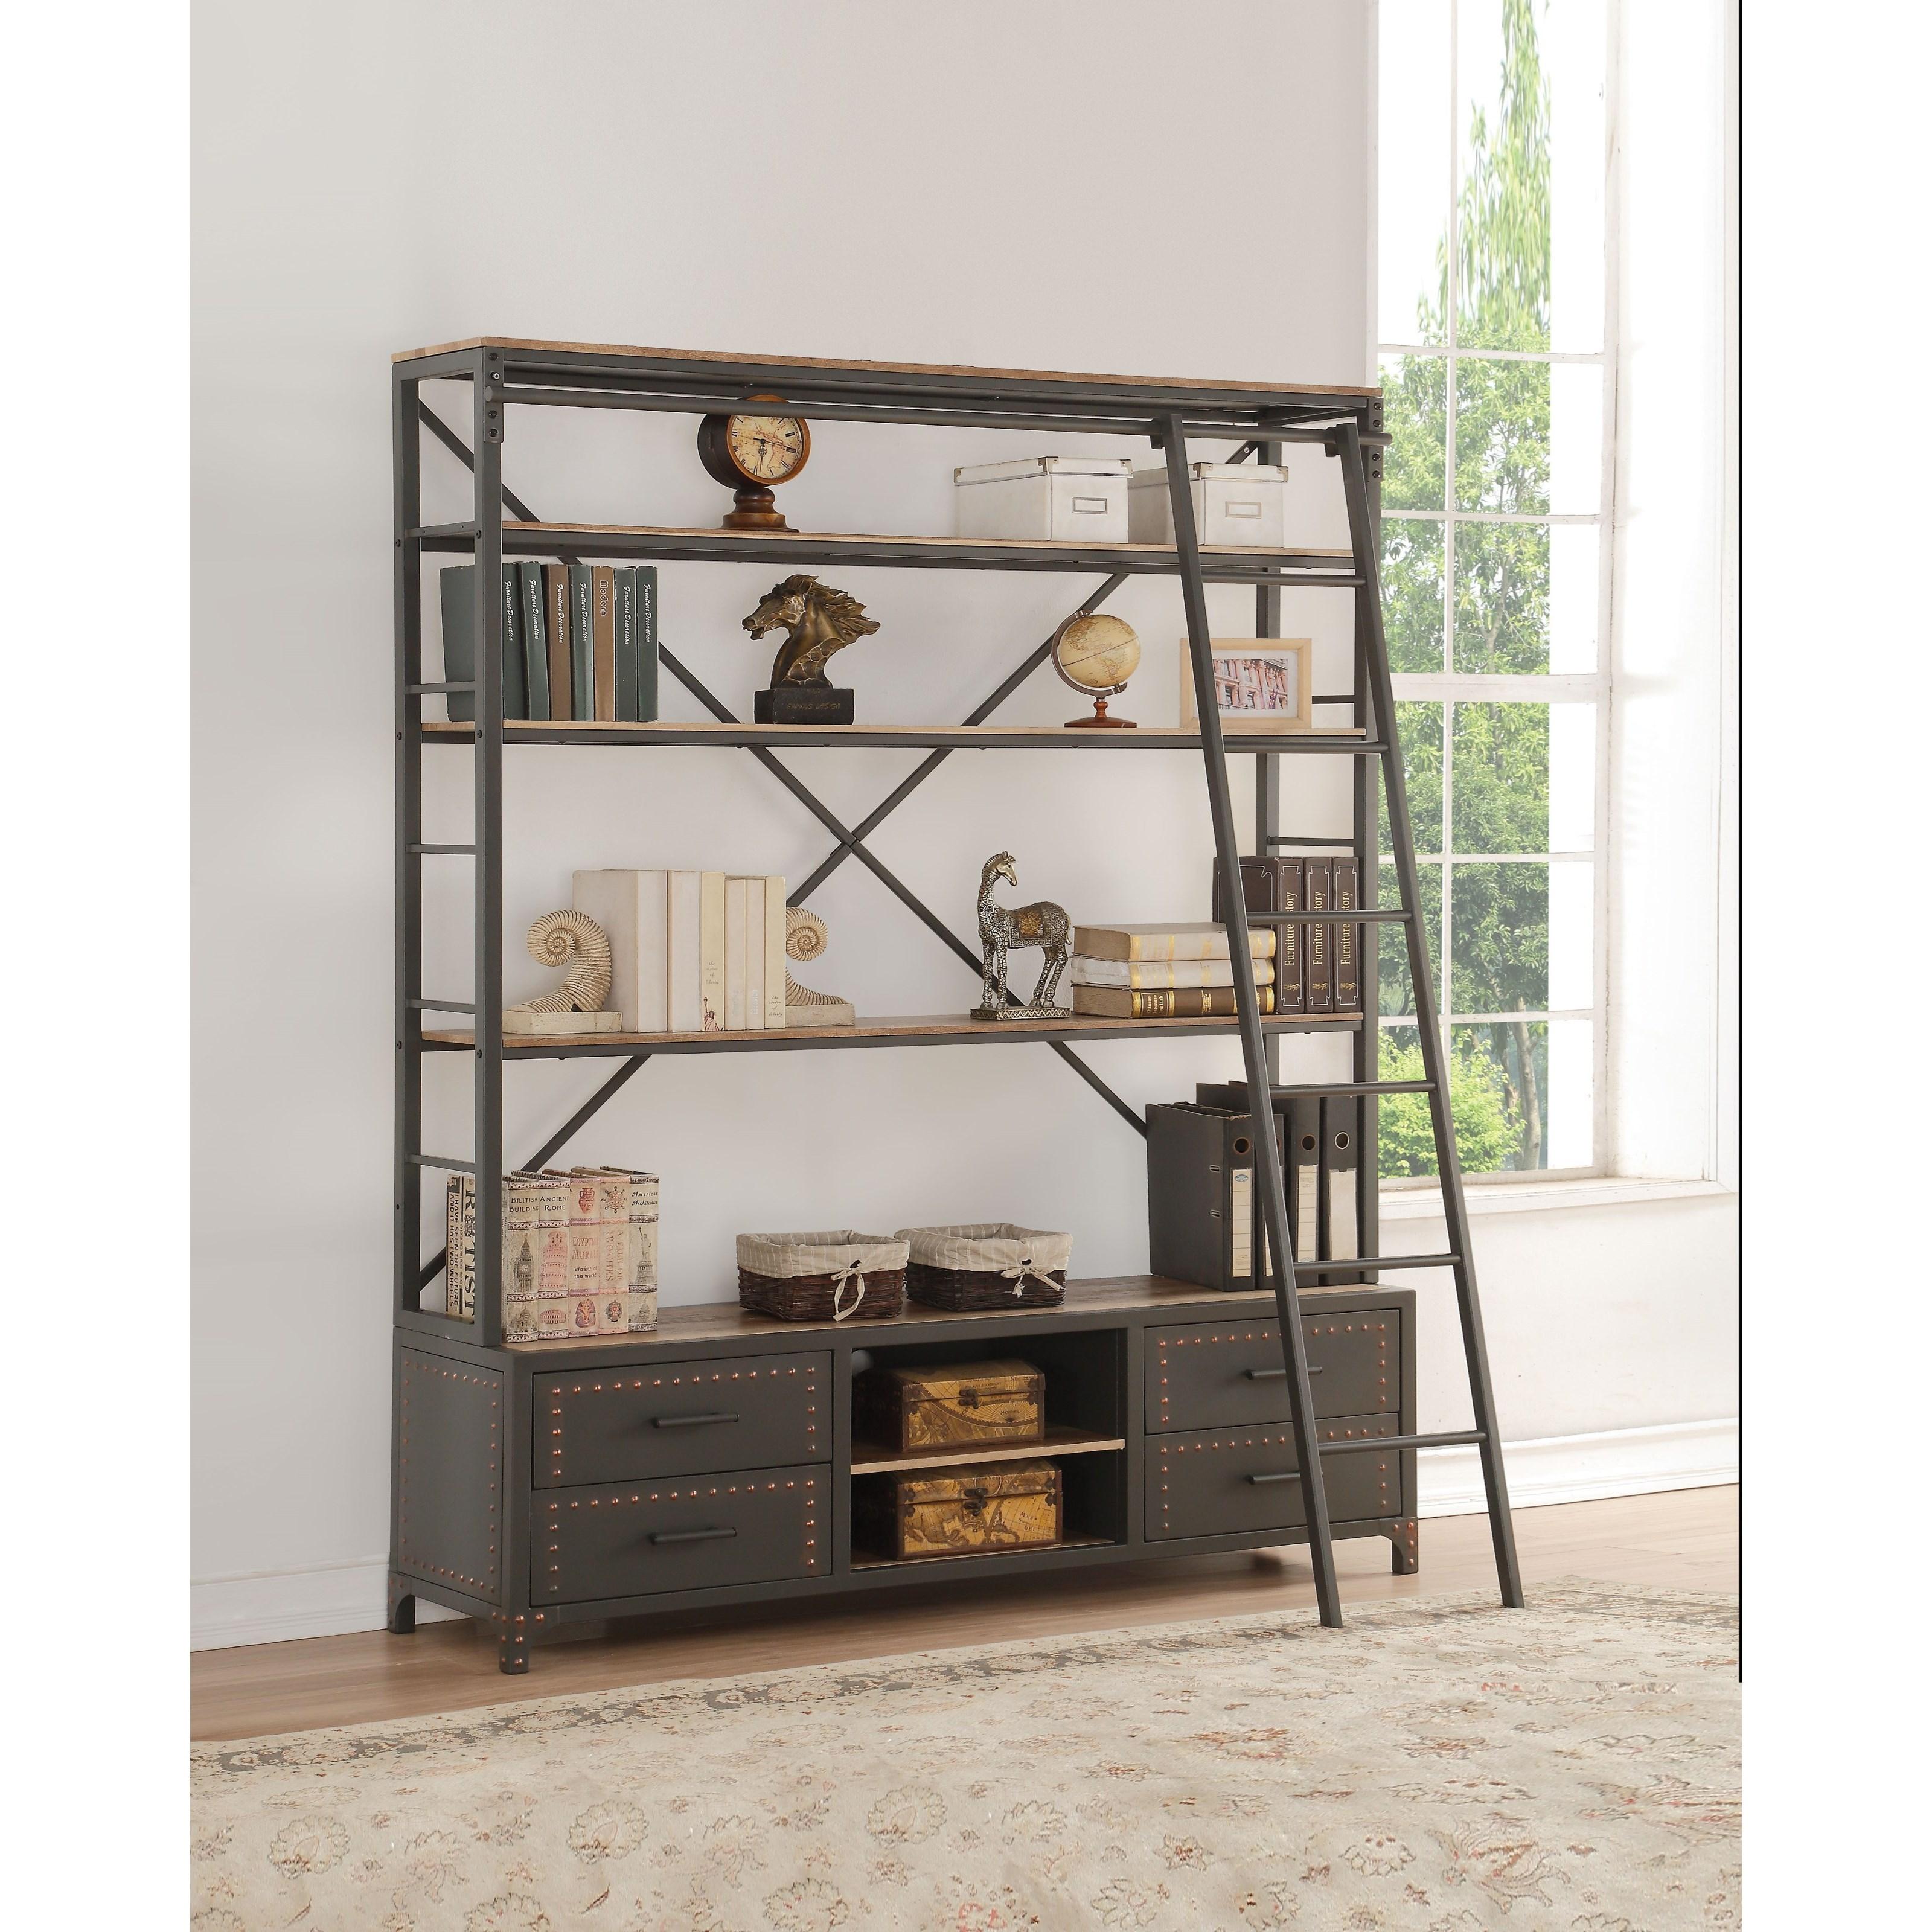 Bookshelf & Ladder